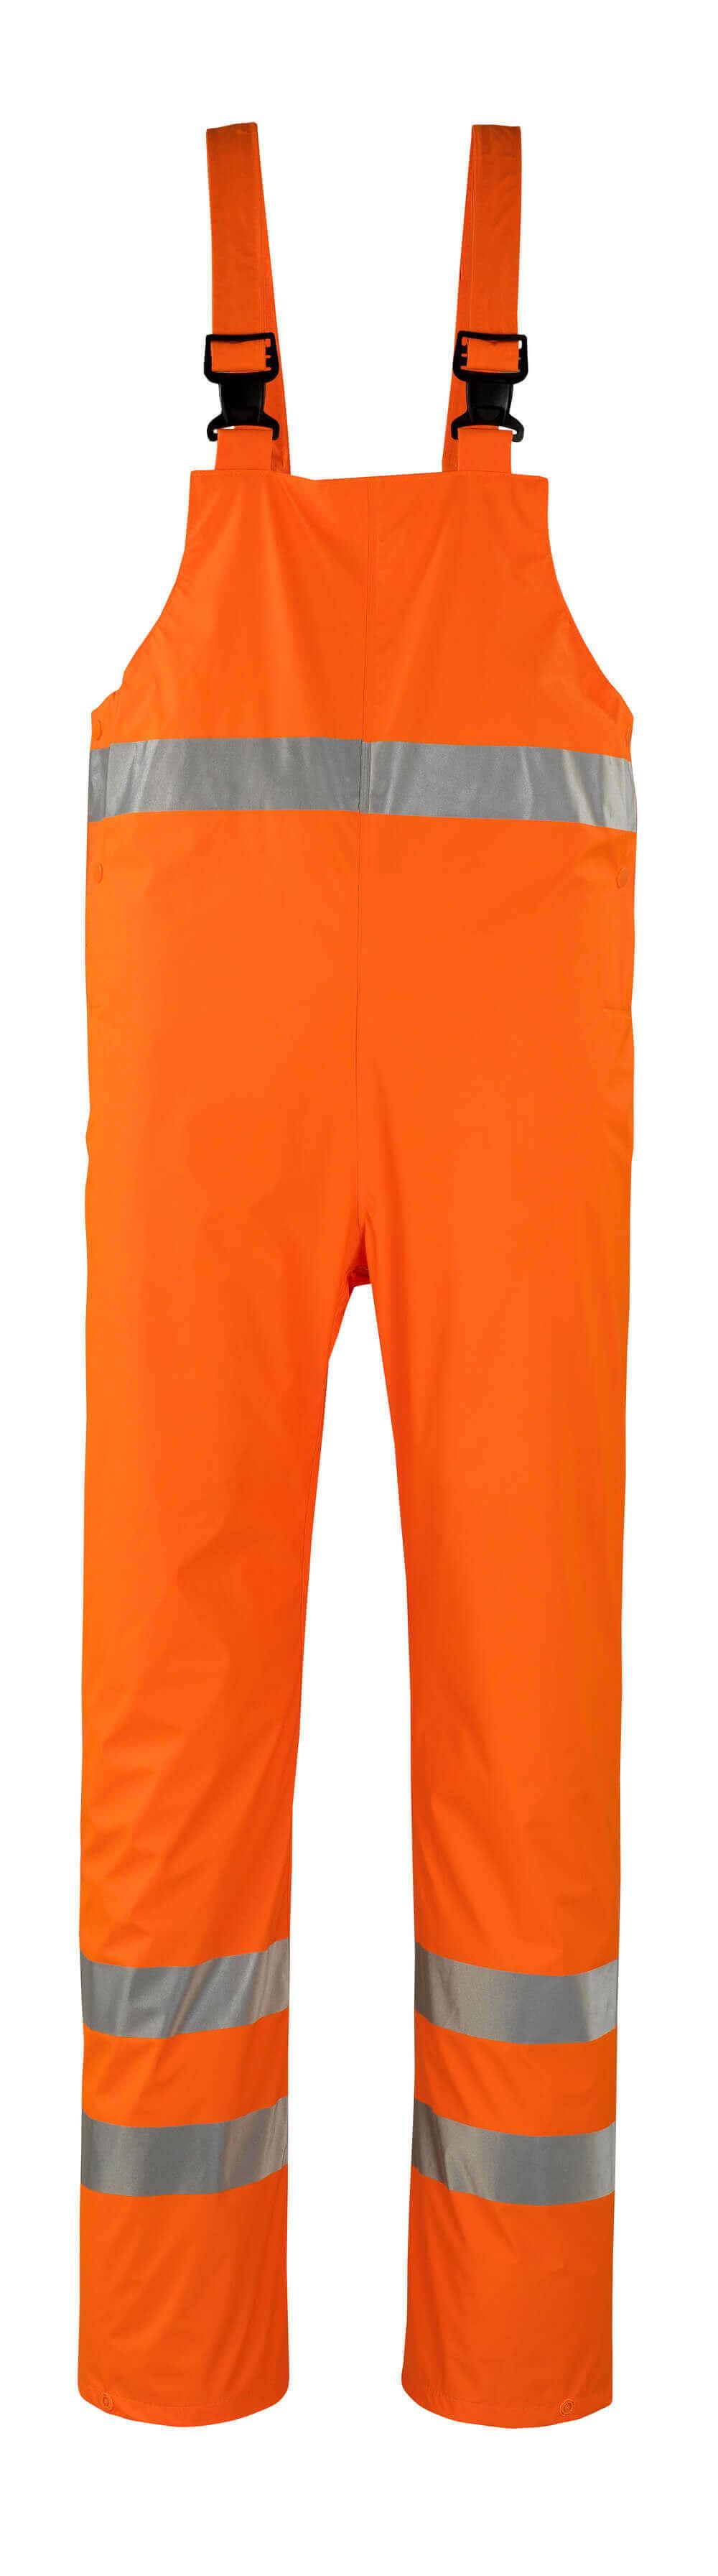 50103-814-14 Regnsnickarbyxor - hi-vis orange